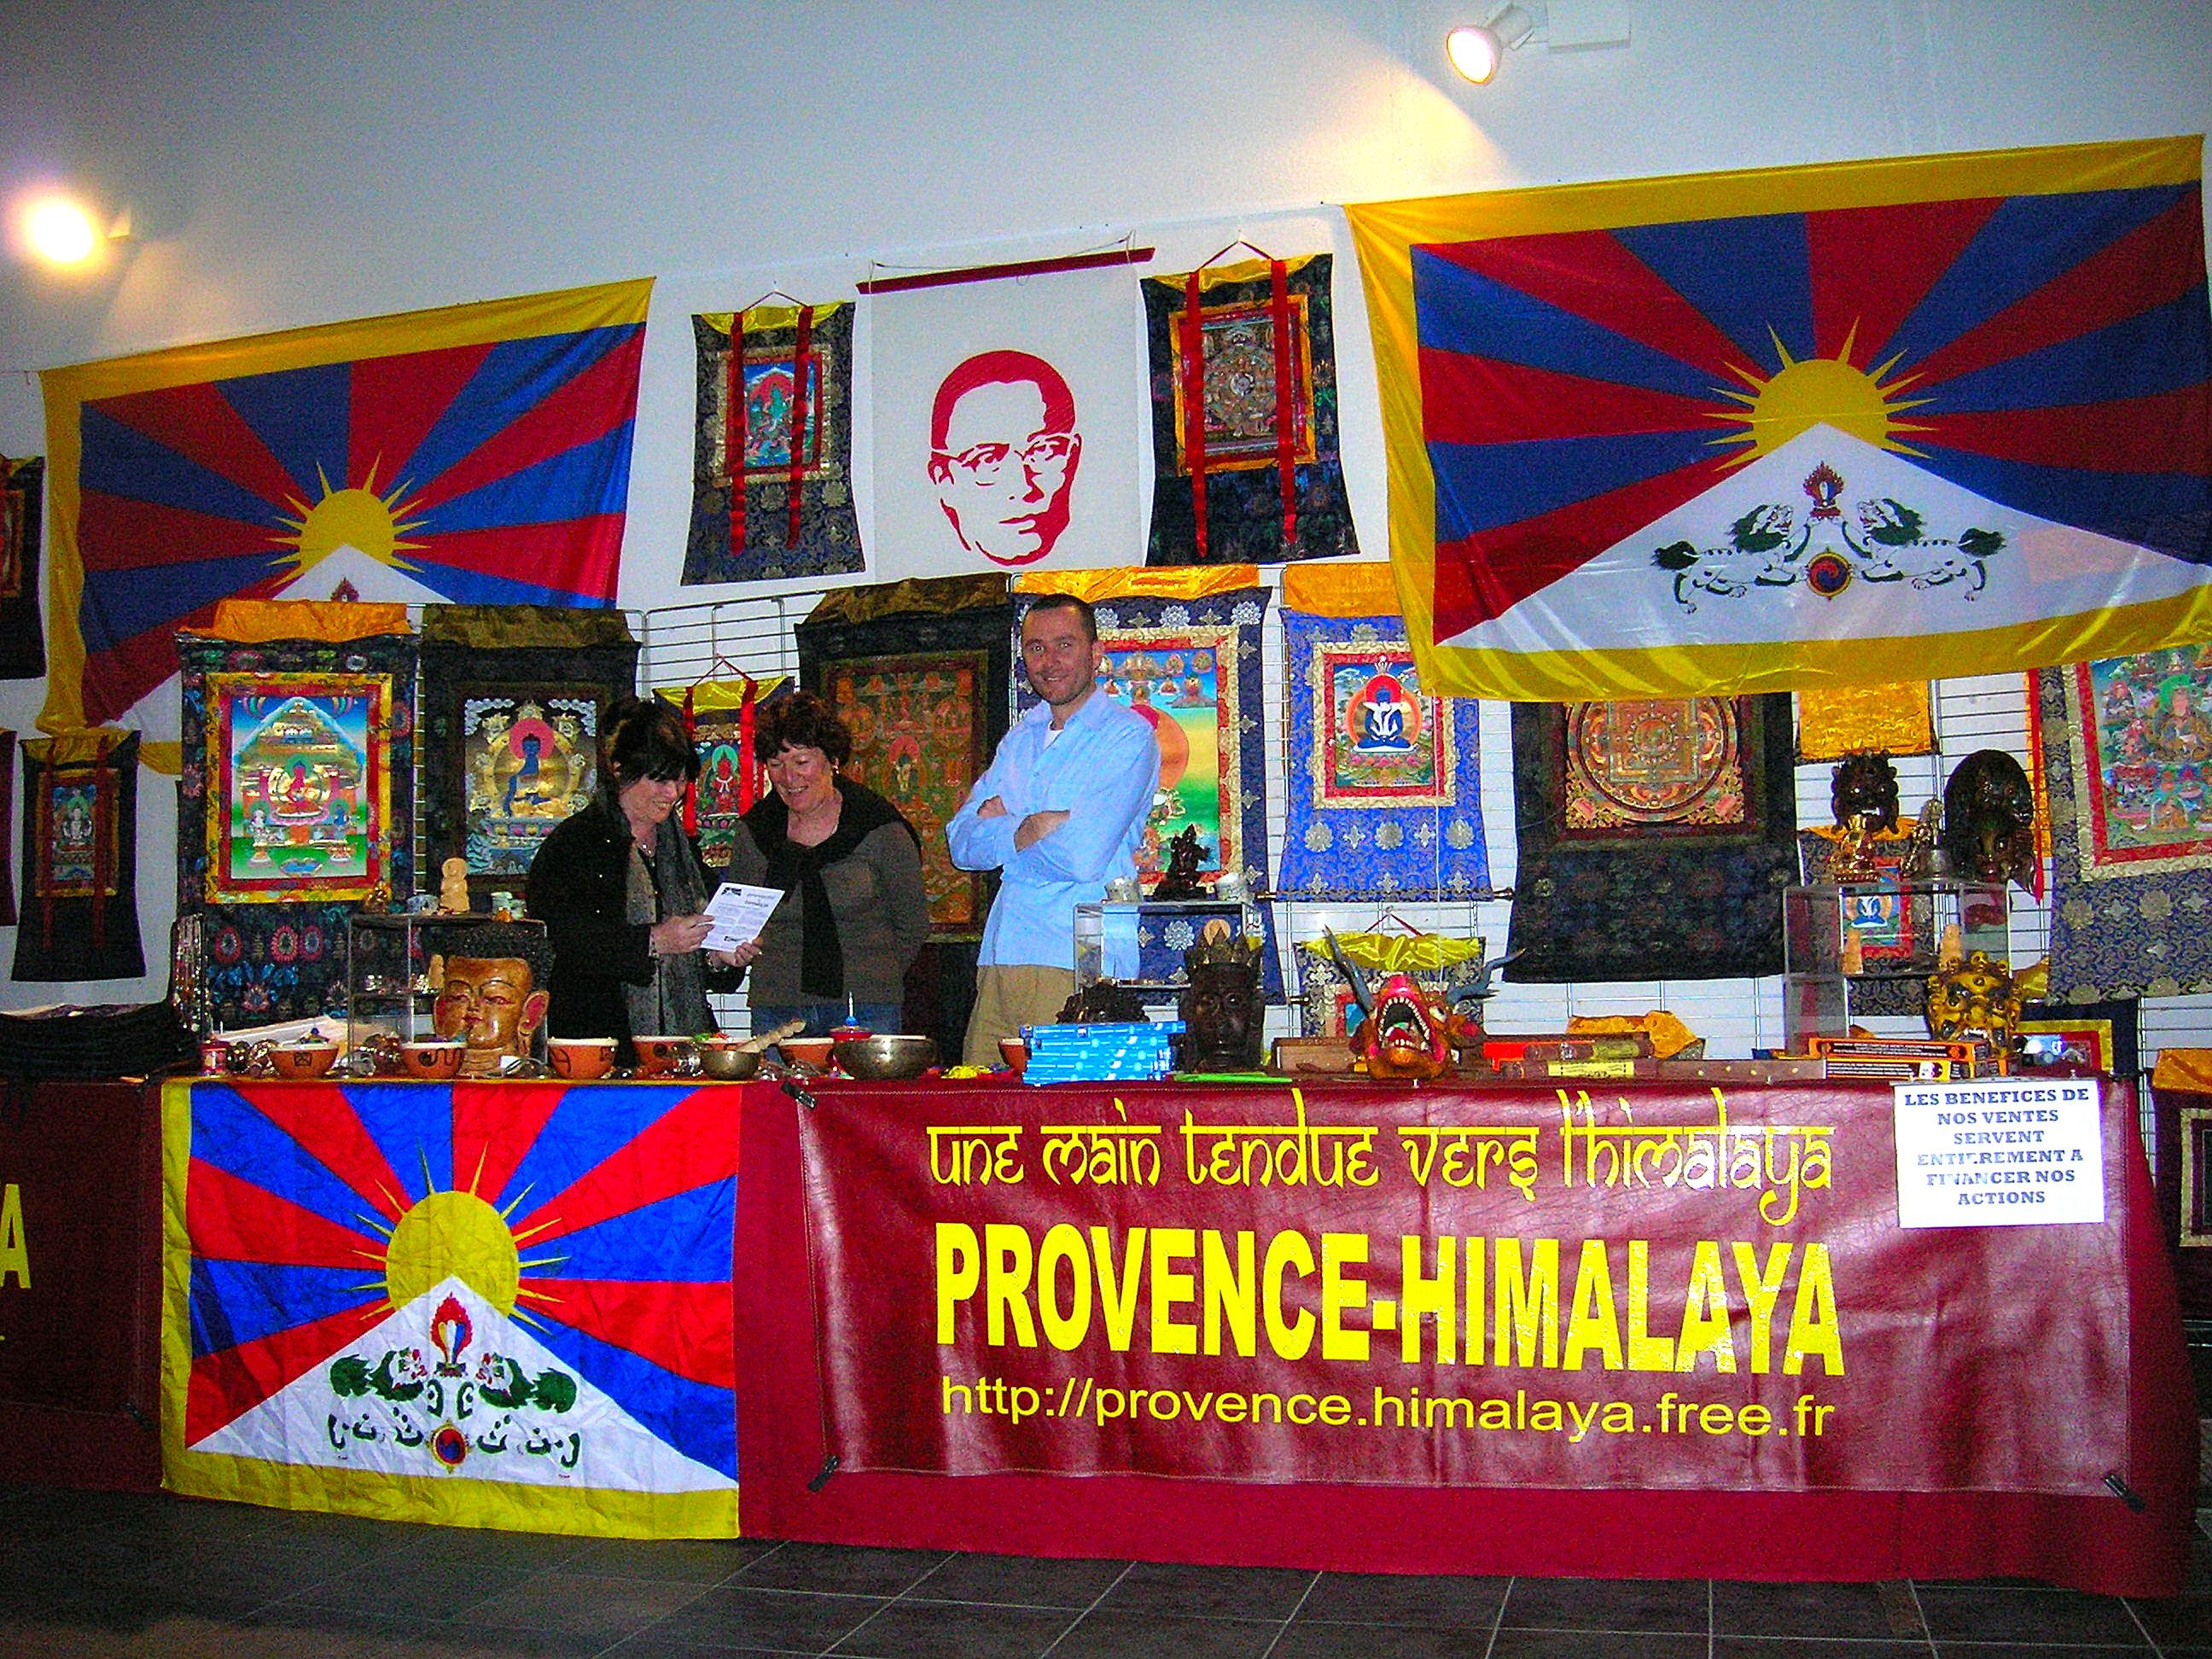 prohimalaya.jpg